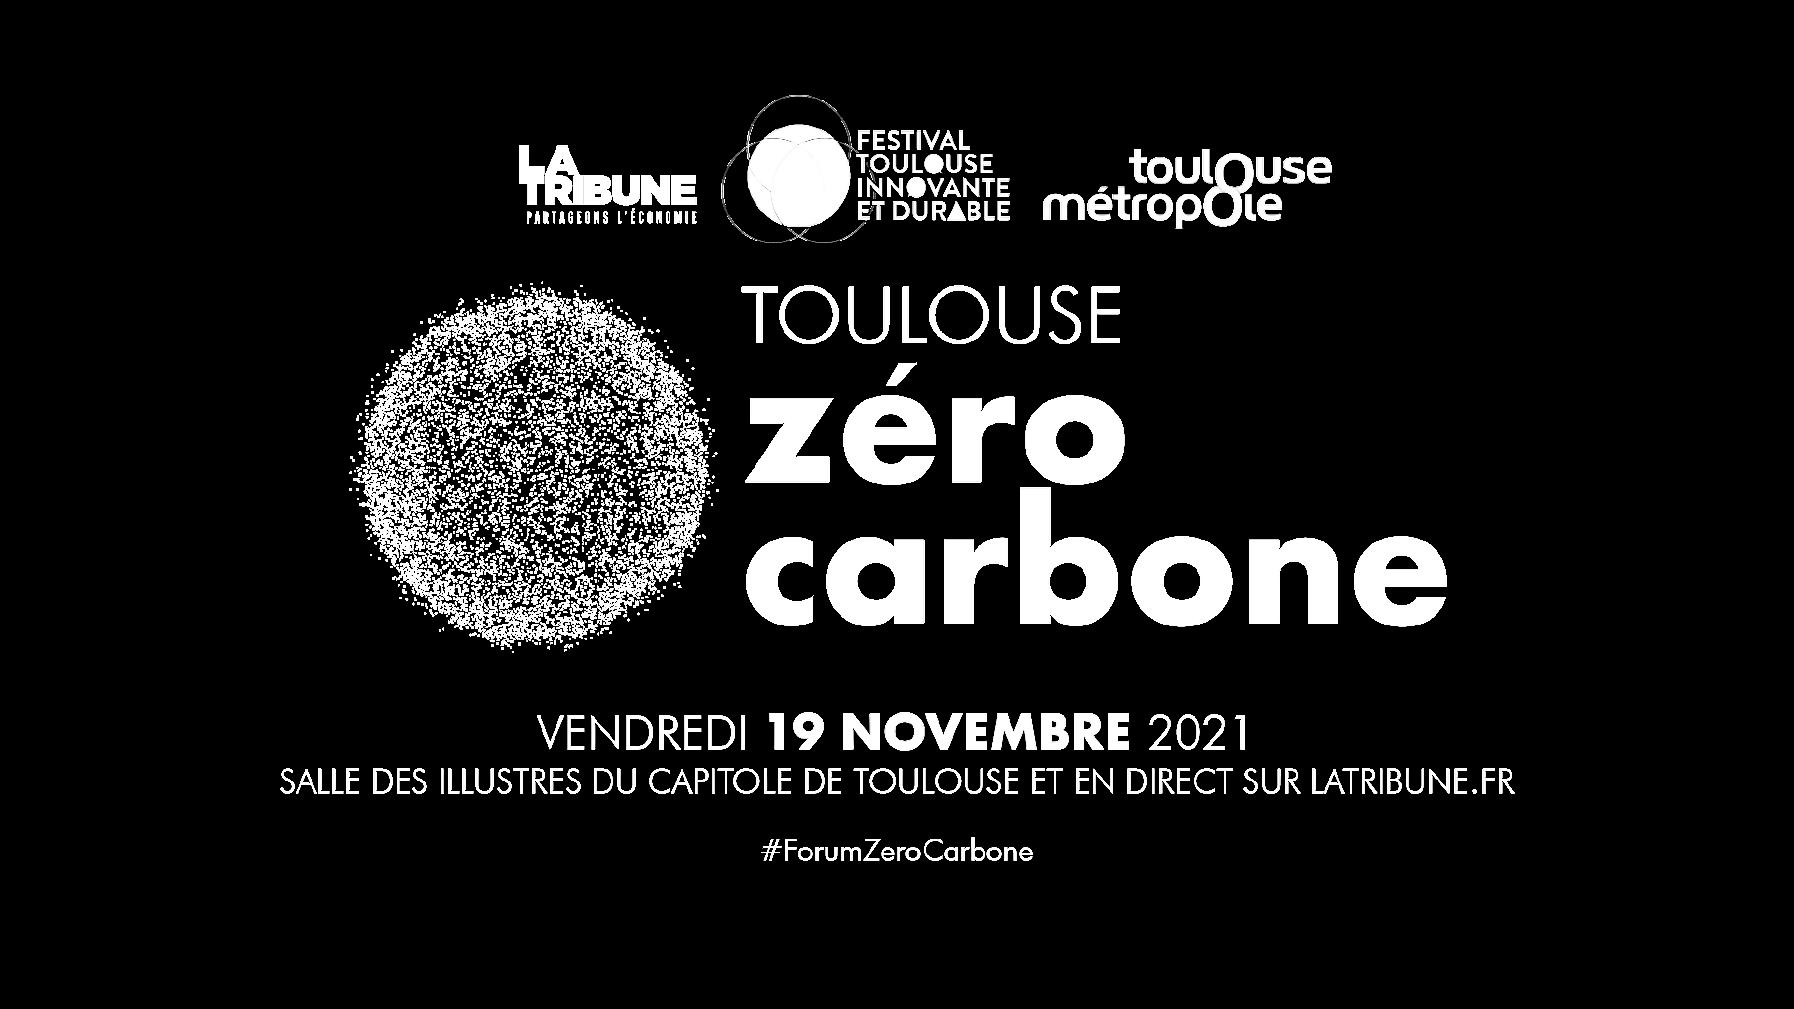 TOULOUSE-ZERO-CARBONE-2021-SITE